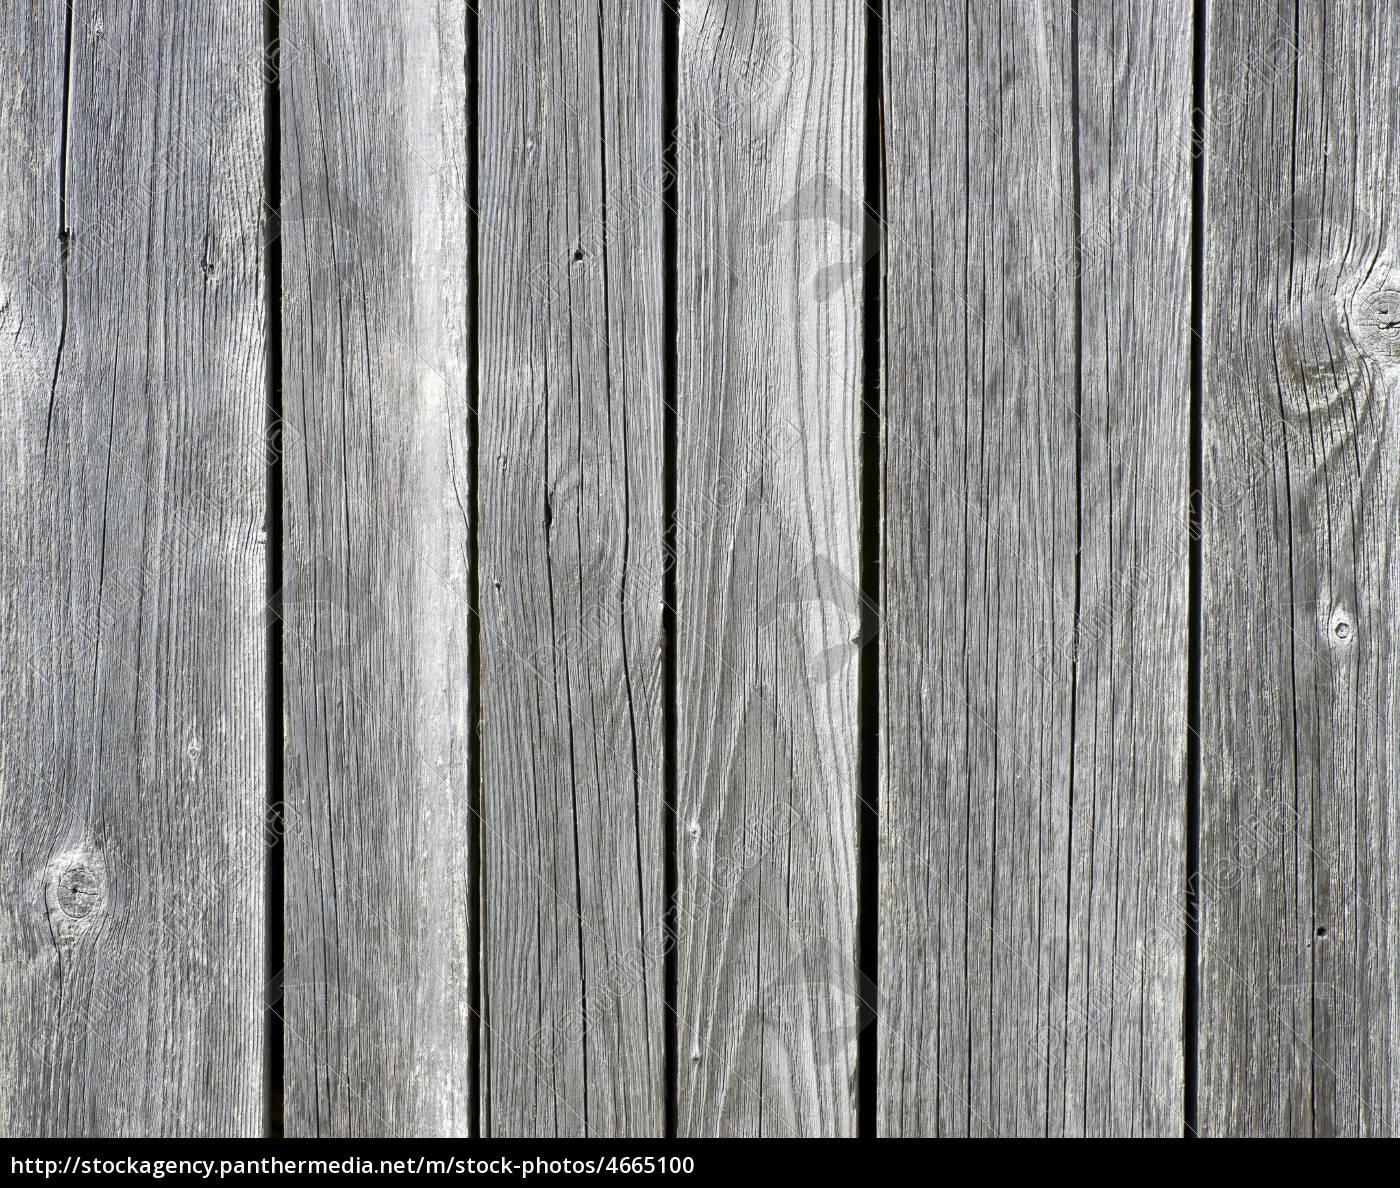 alte holzbretter vertikal lizenzfreies foto 4665100. Black Bedroom Furniture Sets. Home Design Ideas